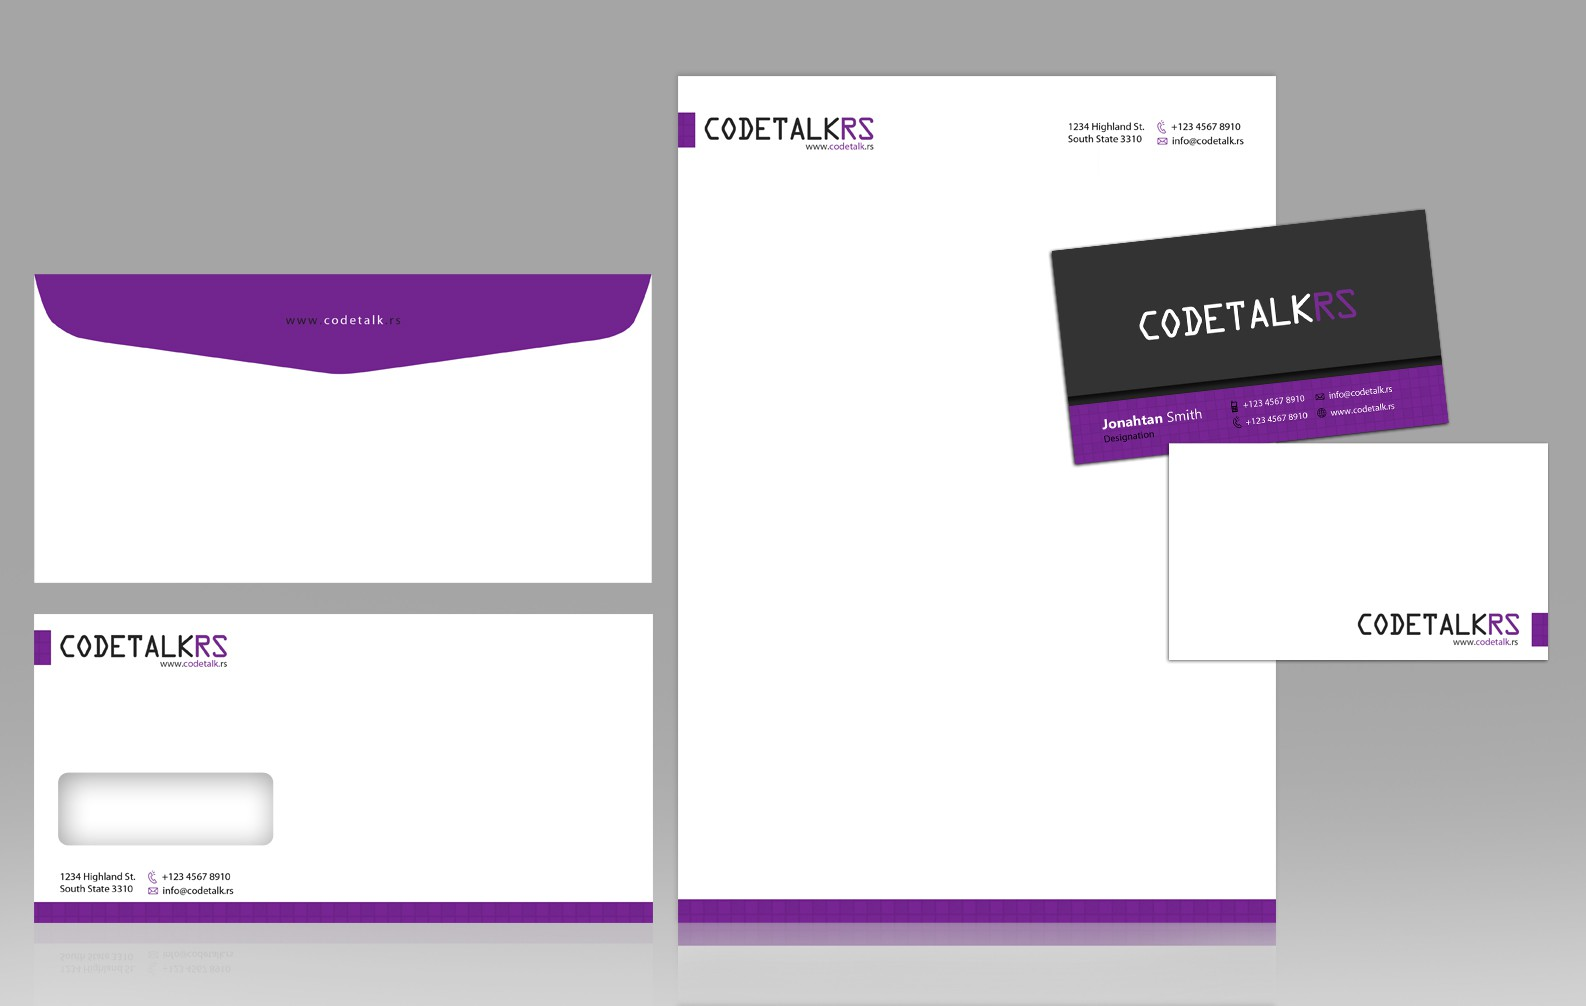 stationery for codetalk.rs, llc